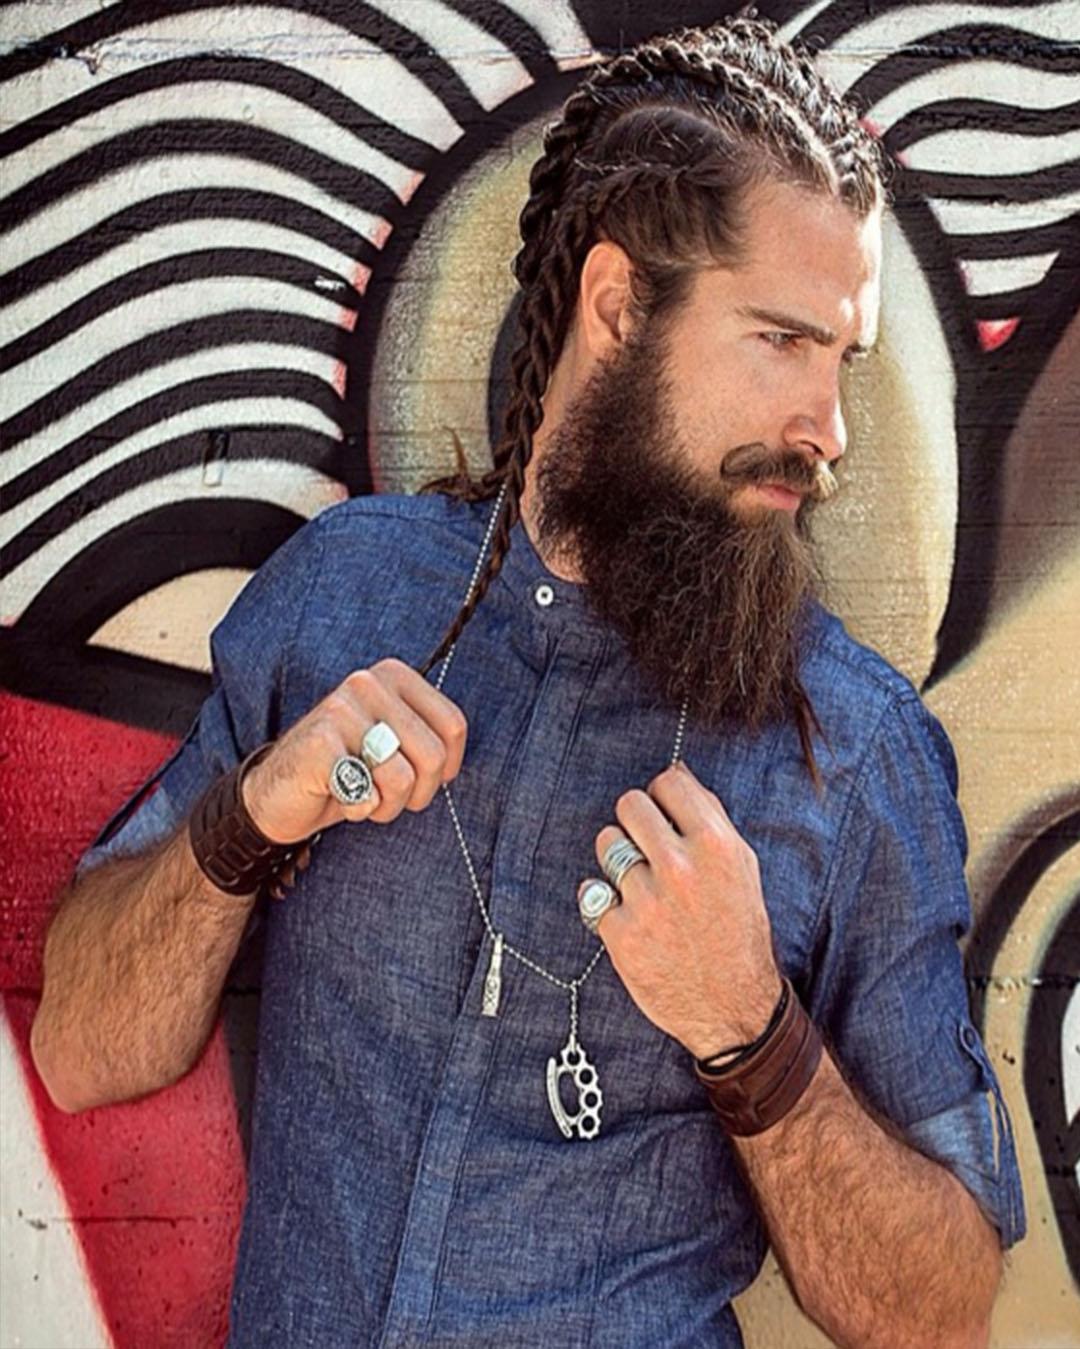 Súper fácil peinados de transicion hombre Galería de cortes de pelo estilo - Peinados para cabello LARGO hombres que no CONOCÍAS - ElSexoso